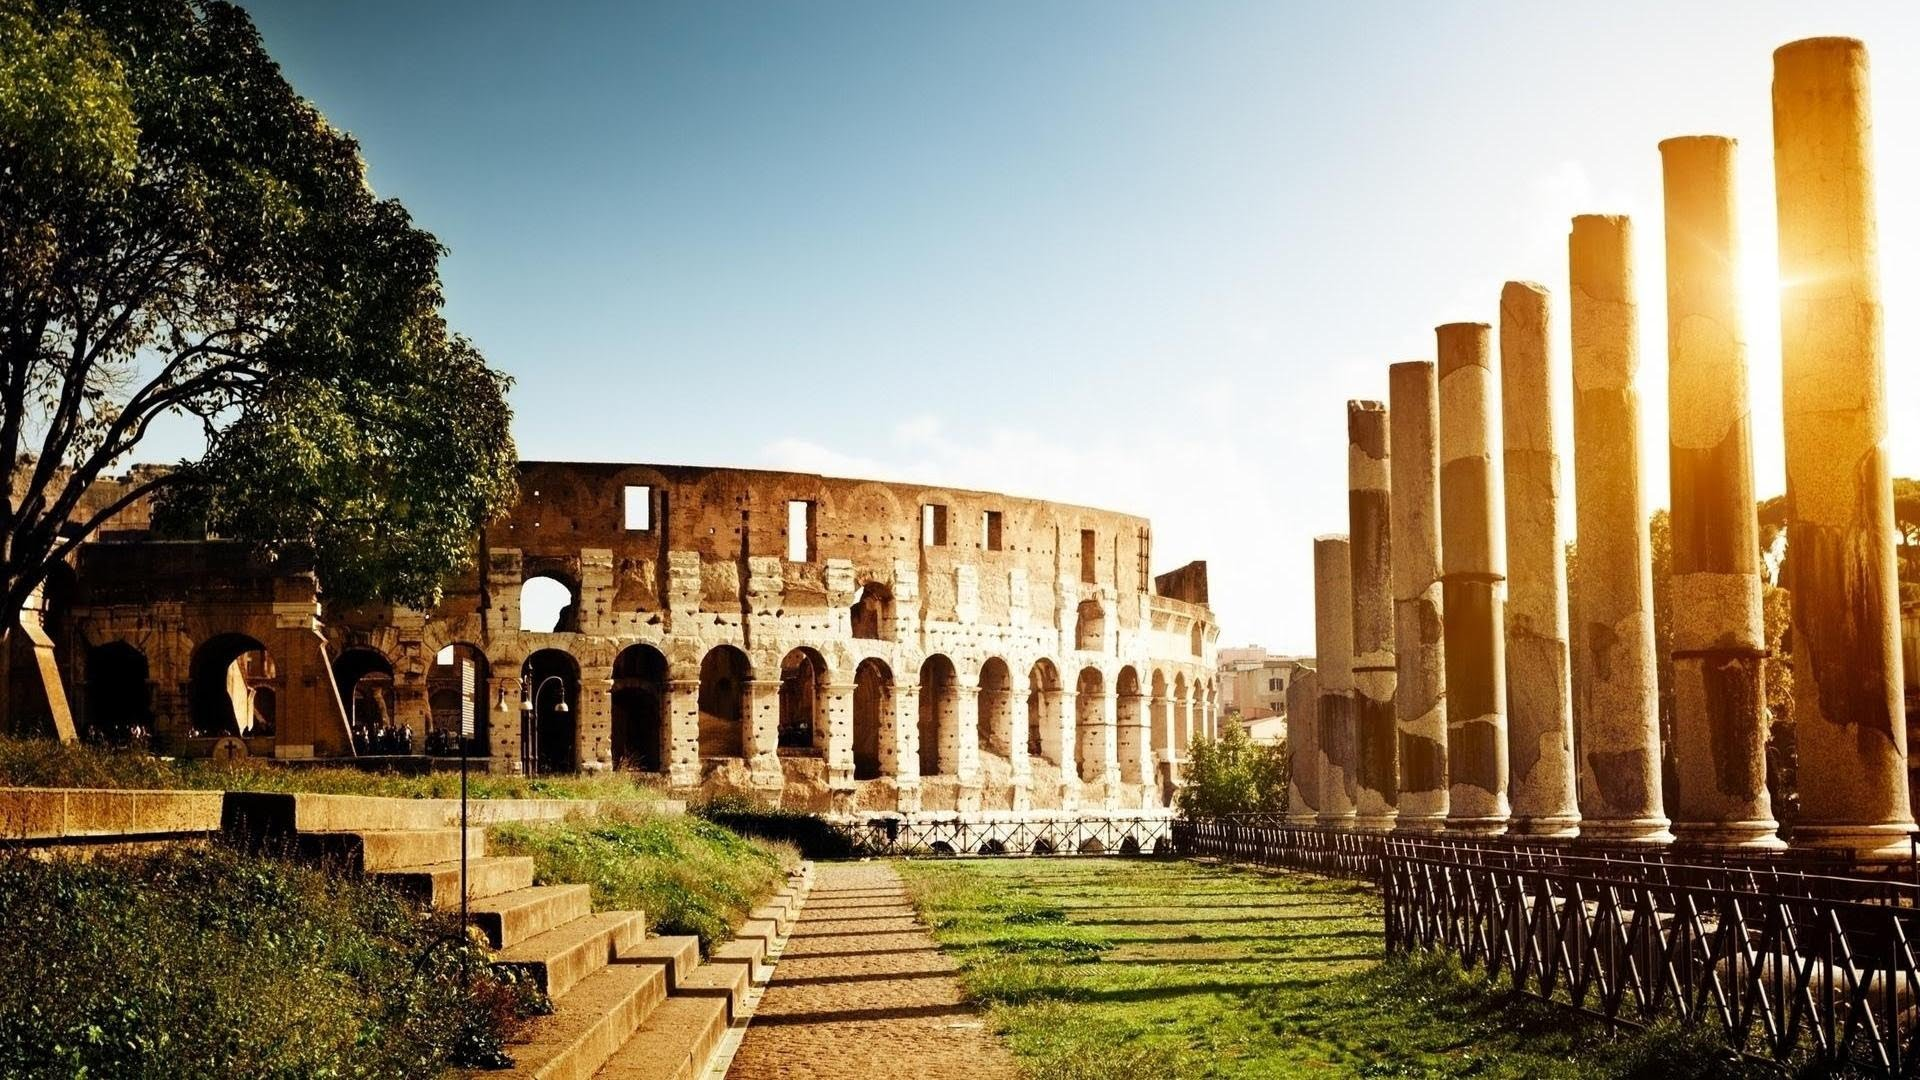 Architecture clipart colosseum Colosseum  Rome The YouTube